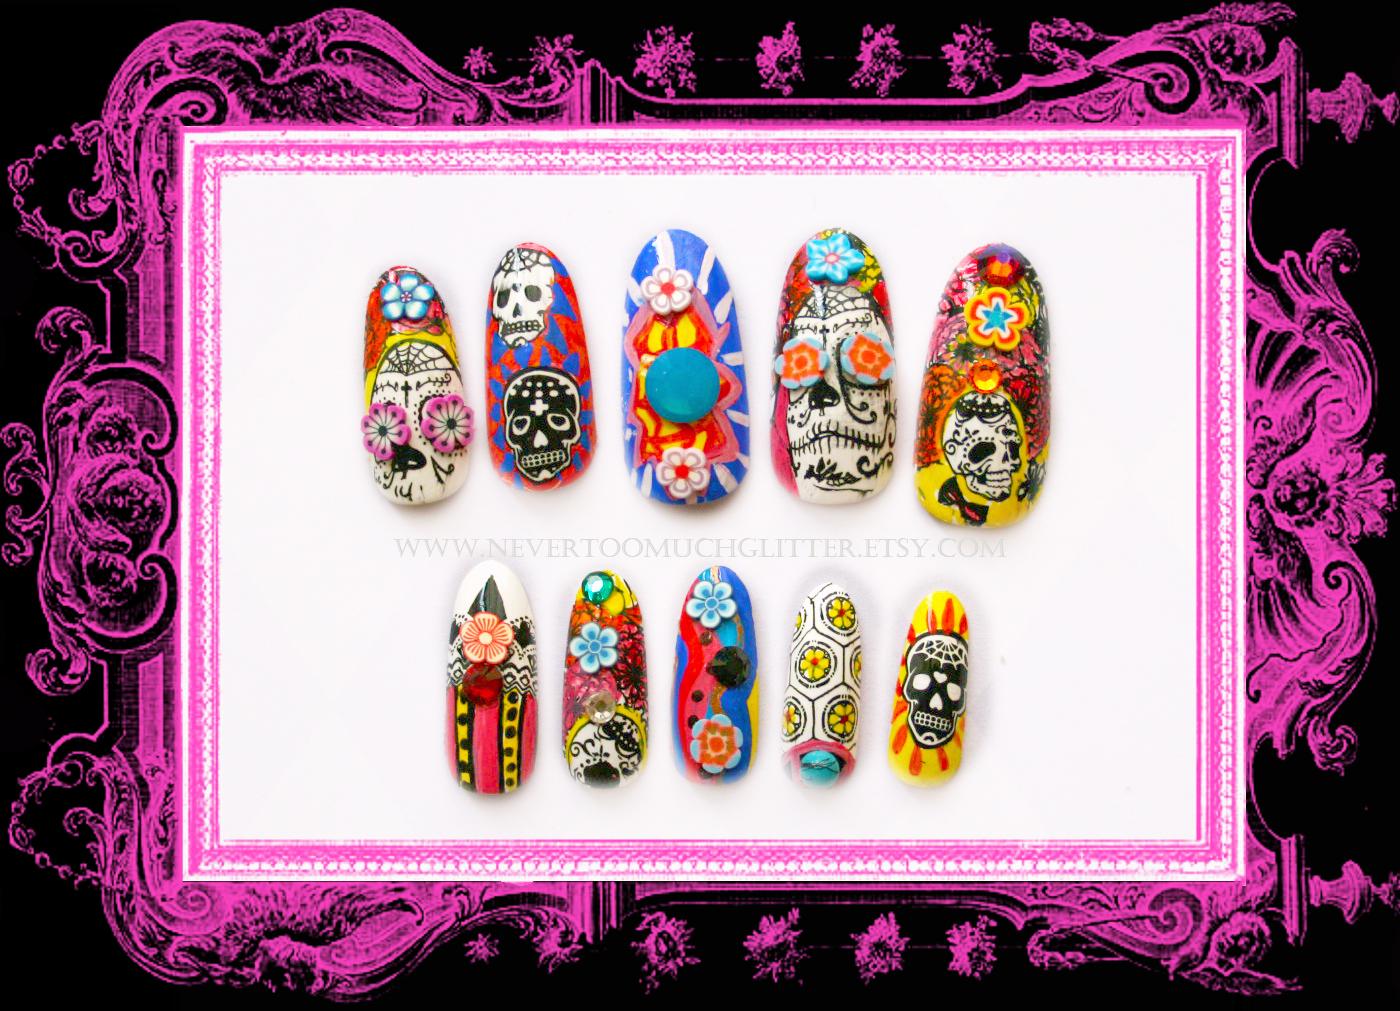 Skulls — Gothic Nail Art by NeverTooMuchGlitter